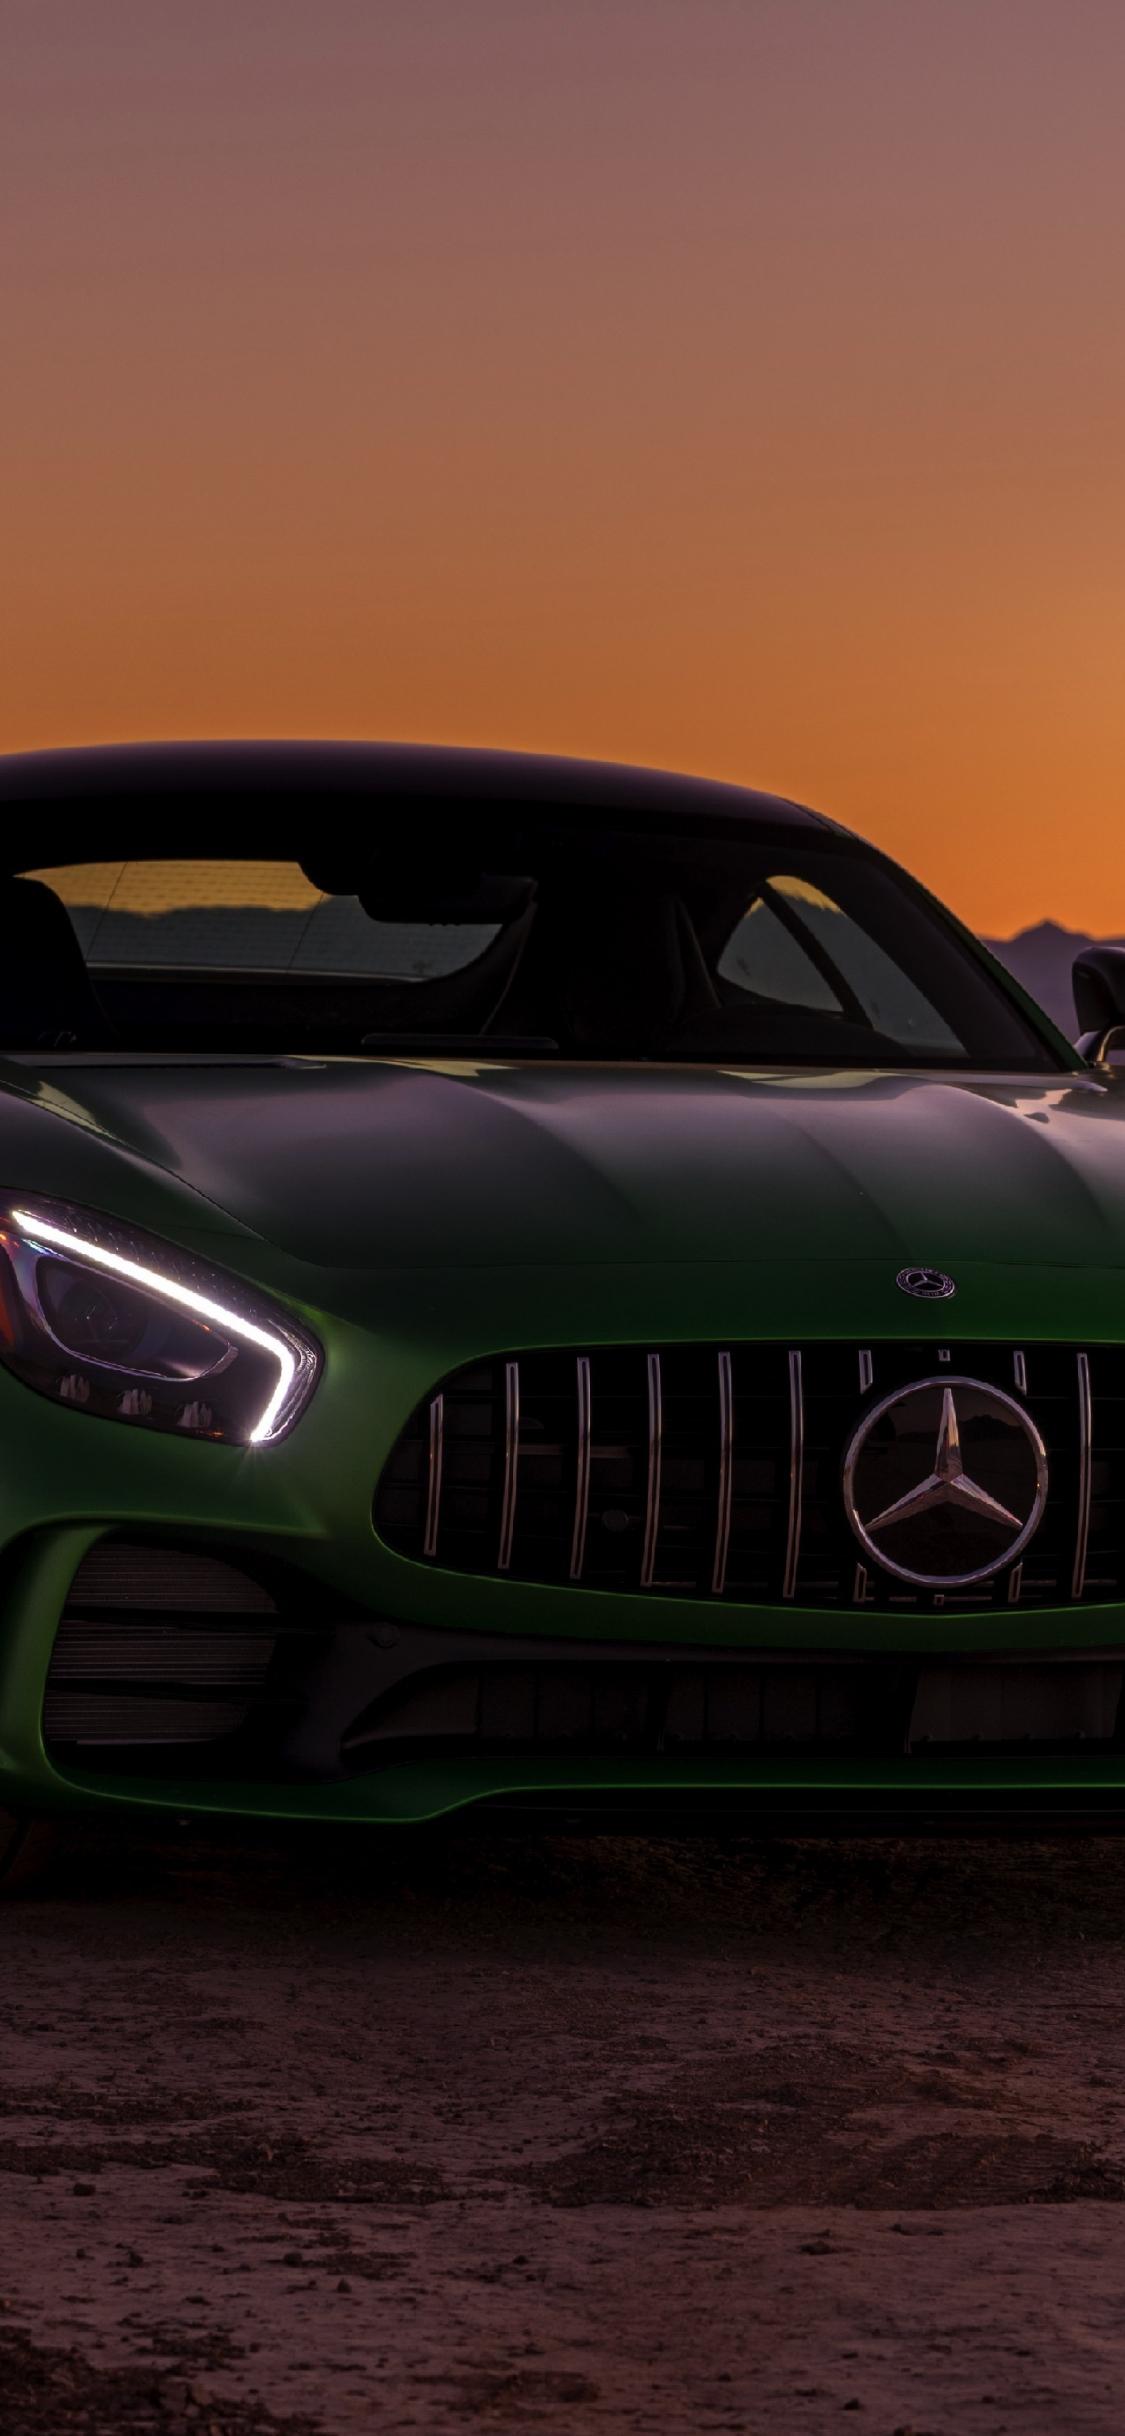 Download 1125x2436 Wallpaper The Mercedes Amg Gt R Sports Car